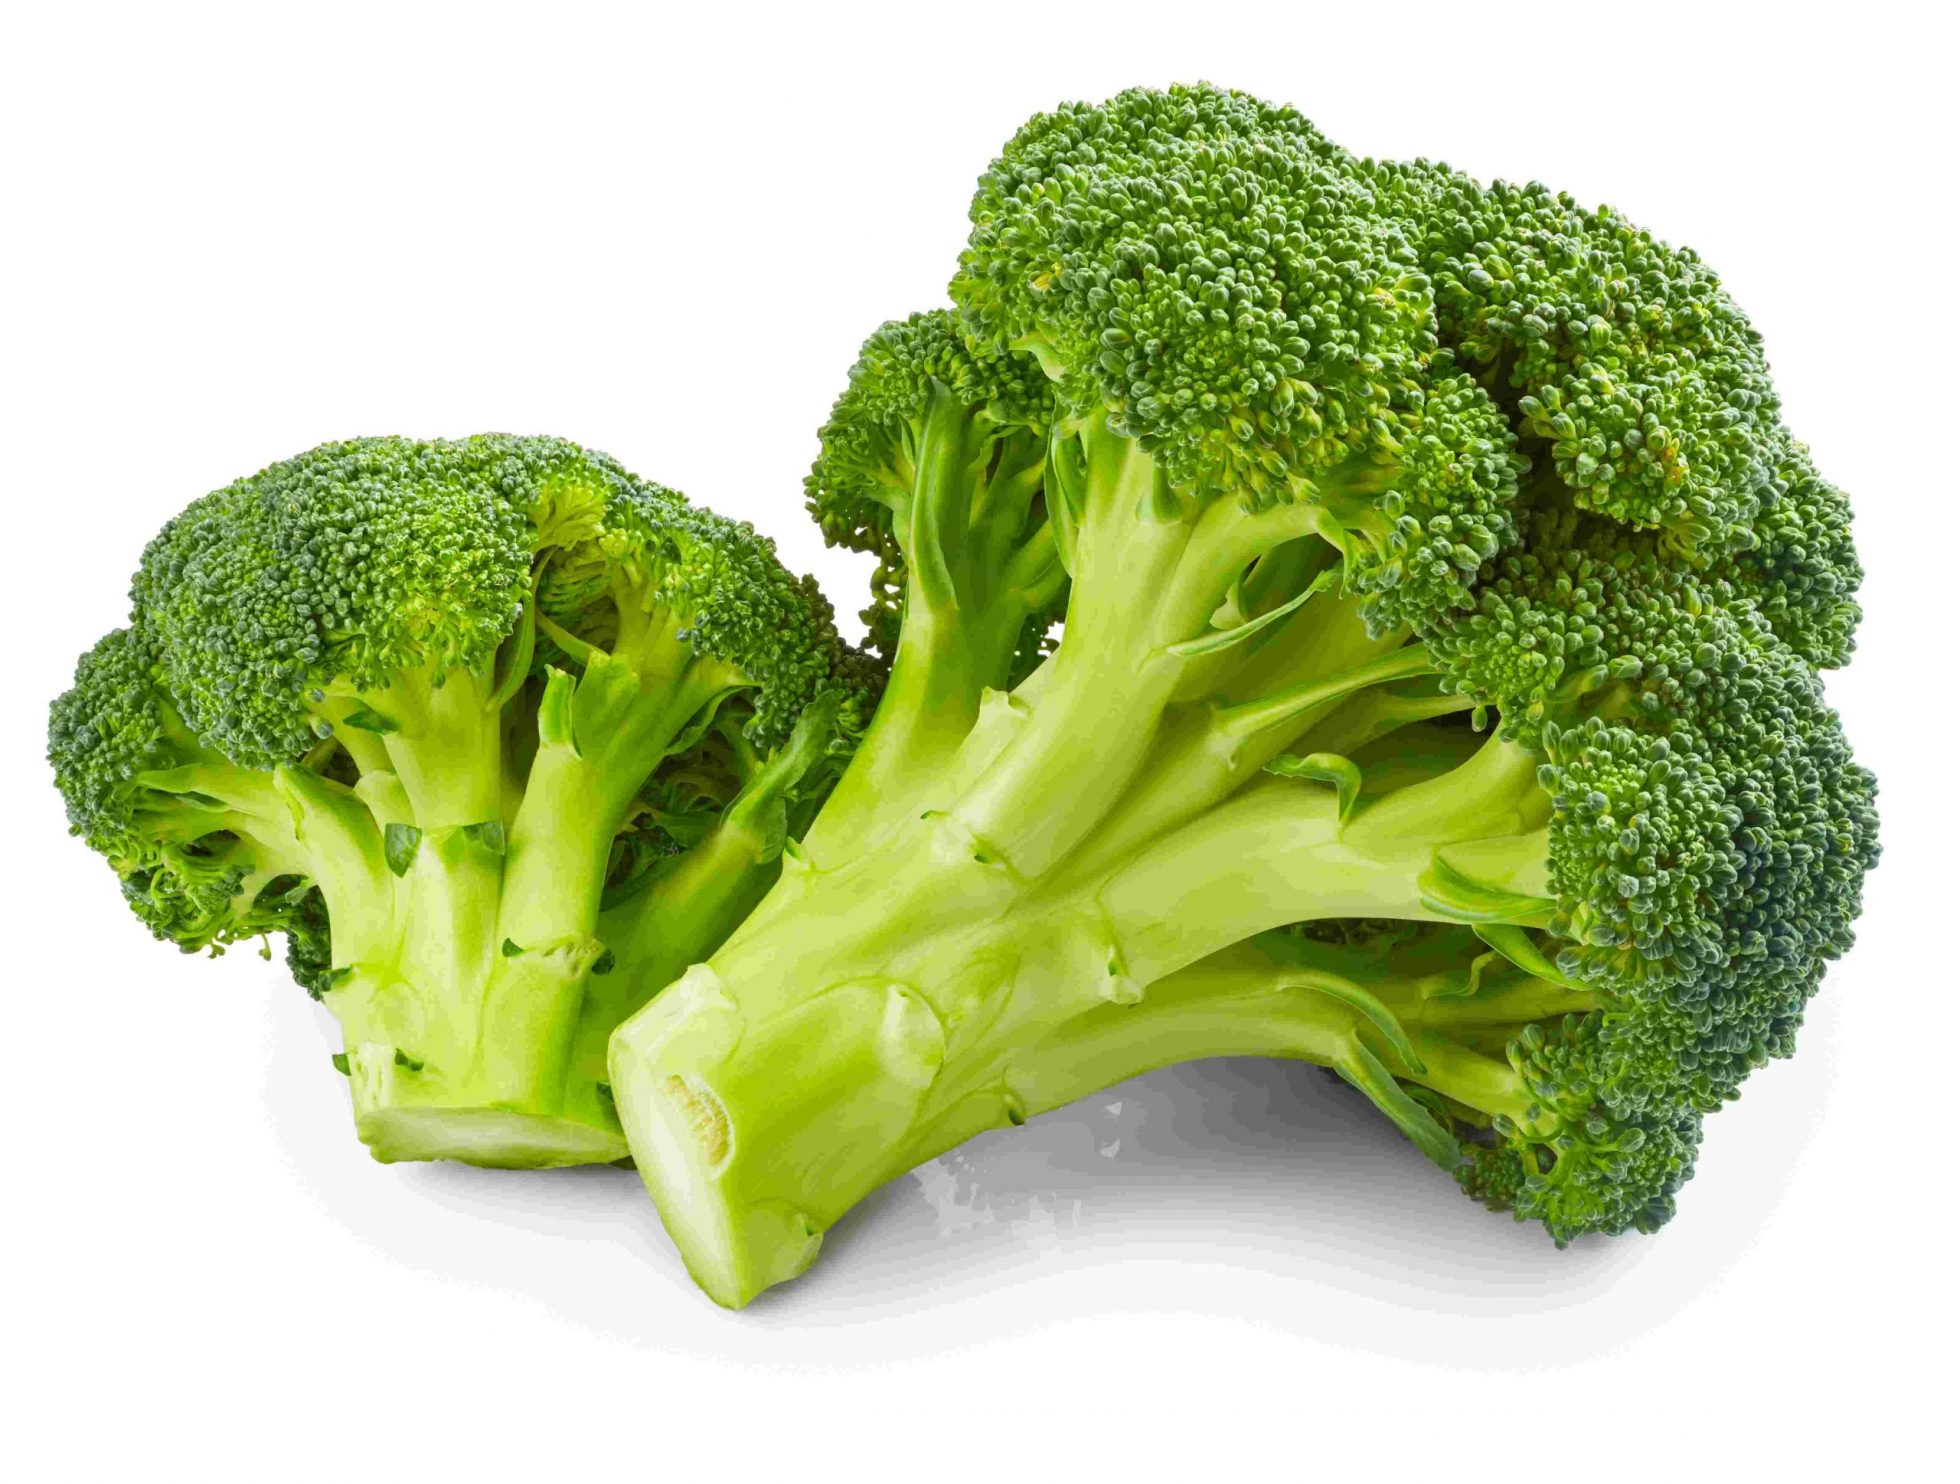 Brocoli (Brassica oleracea/italica)